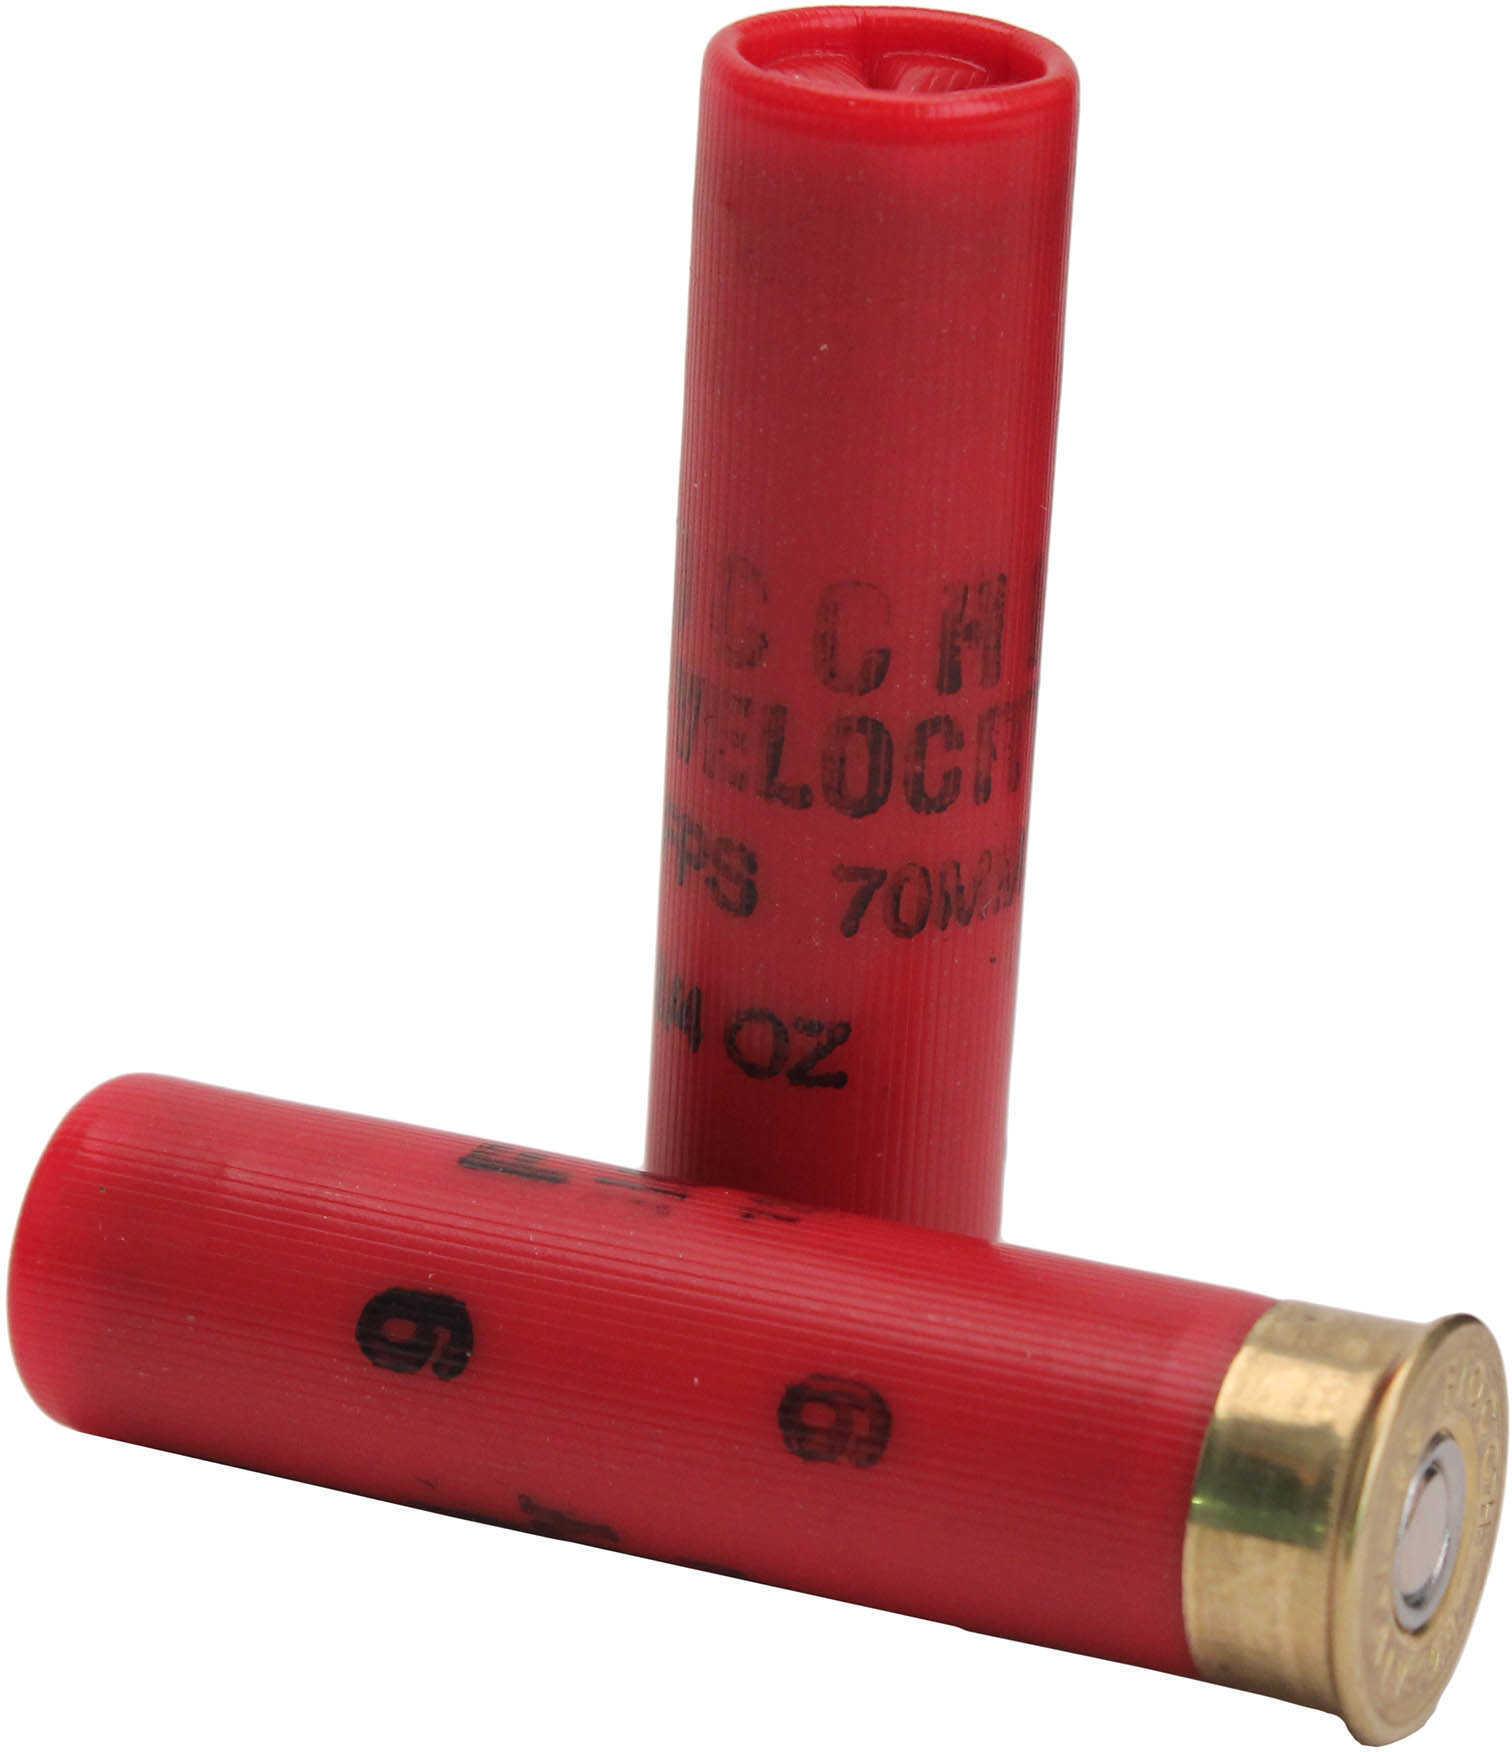 "Fiocchi Ammo 28 Gauge 2 3/4"" .75Oz #9 High Velocity 25 Rounds Ammunition 28HV9"